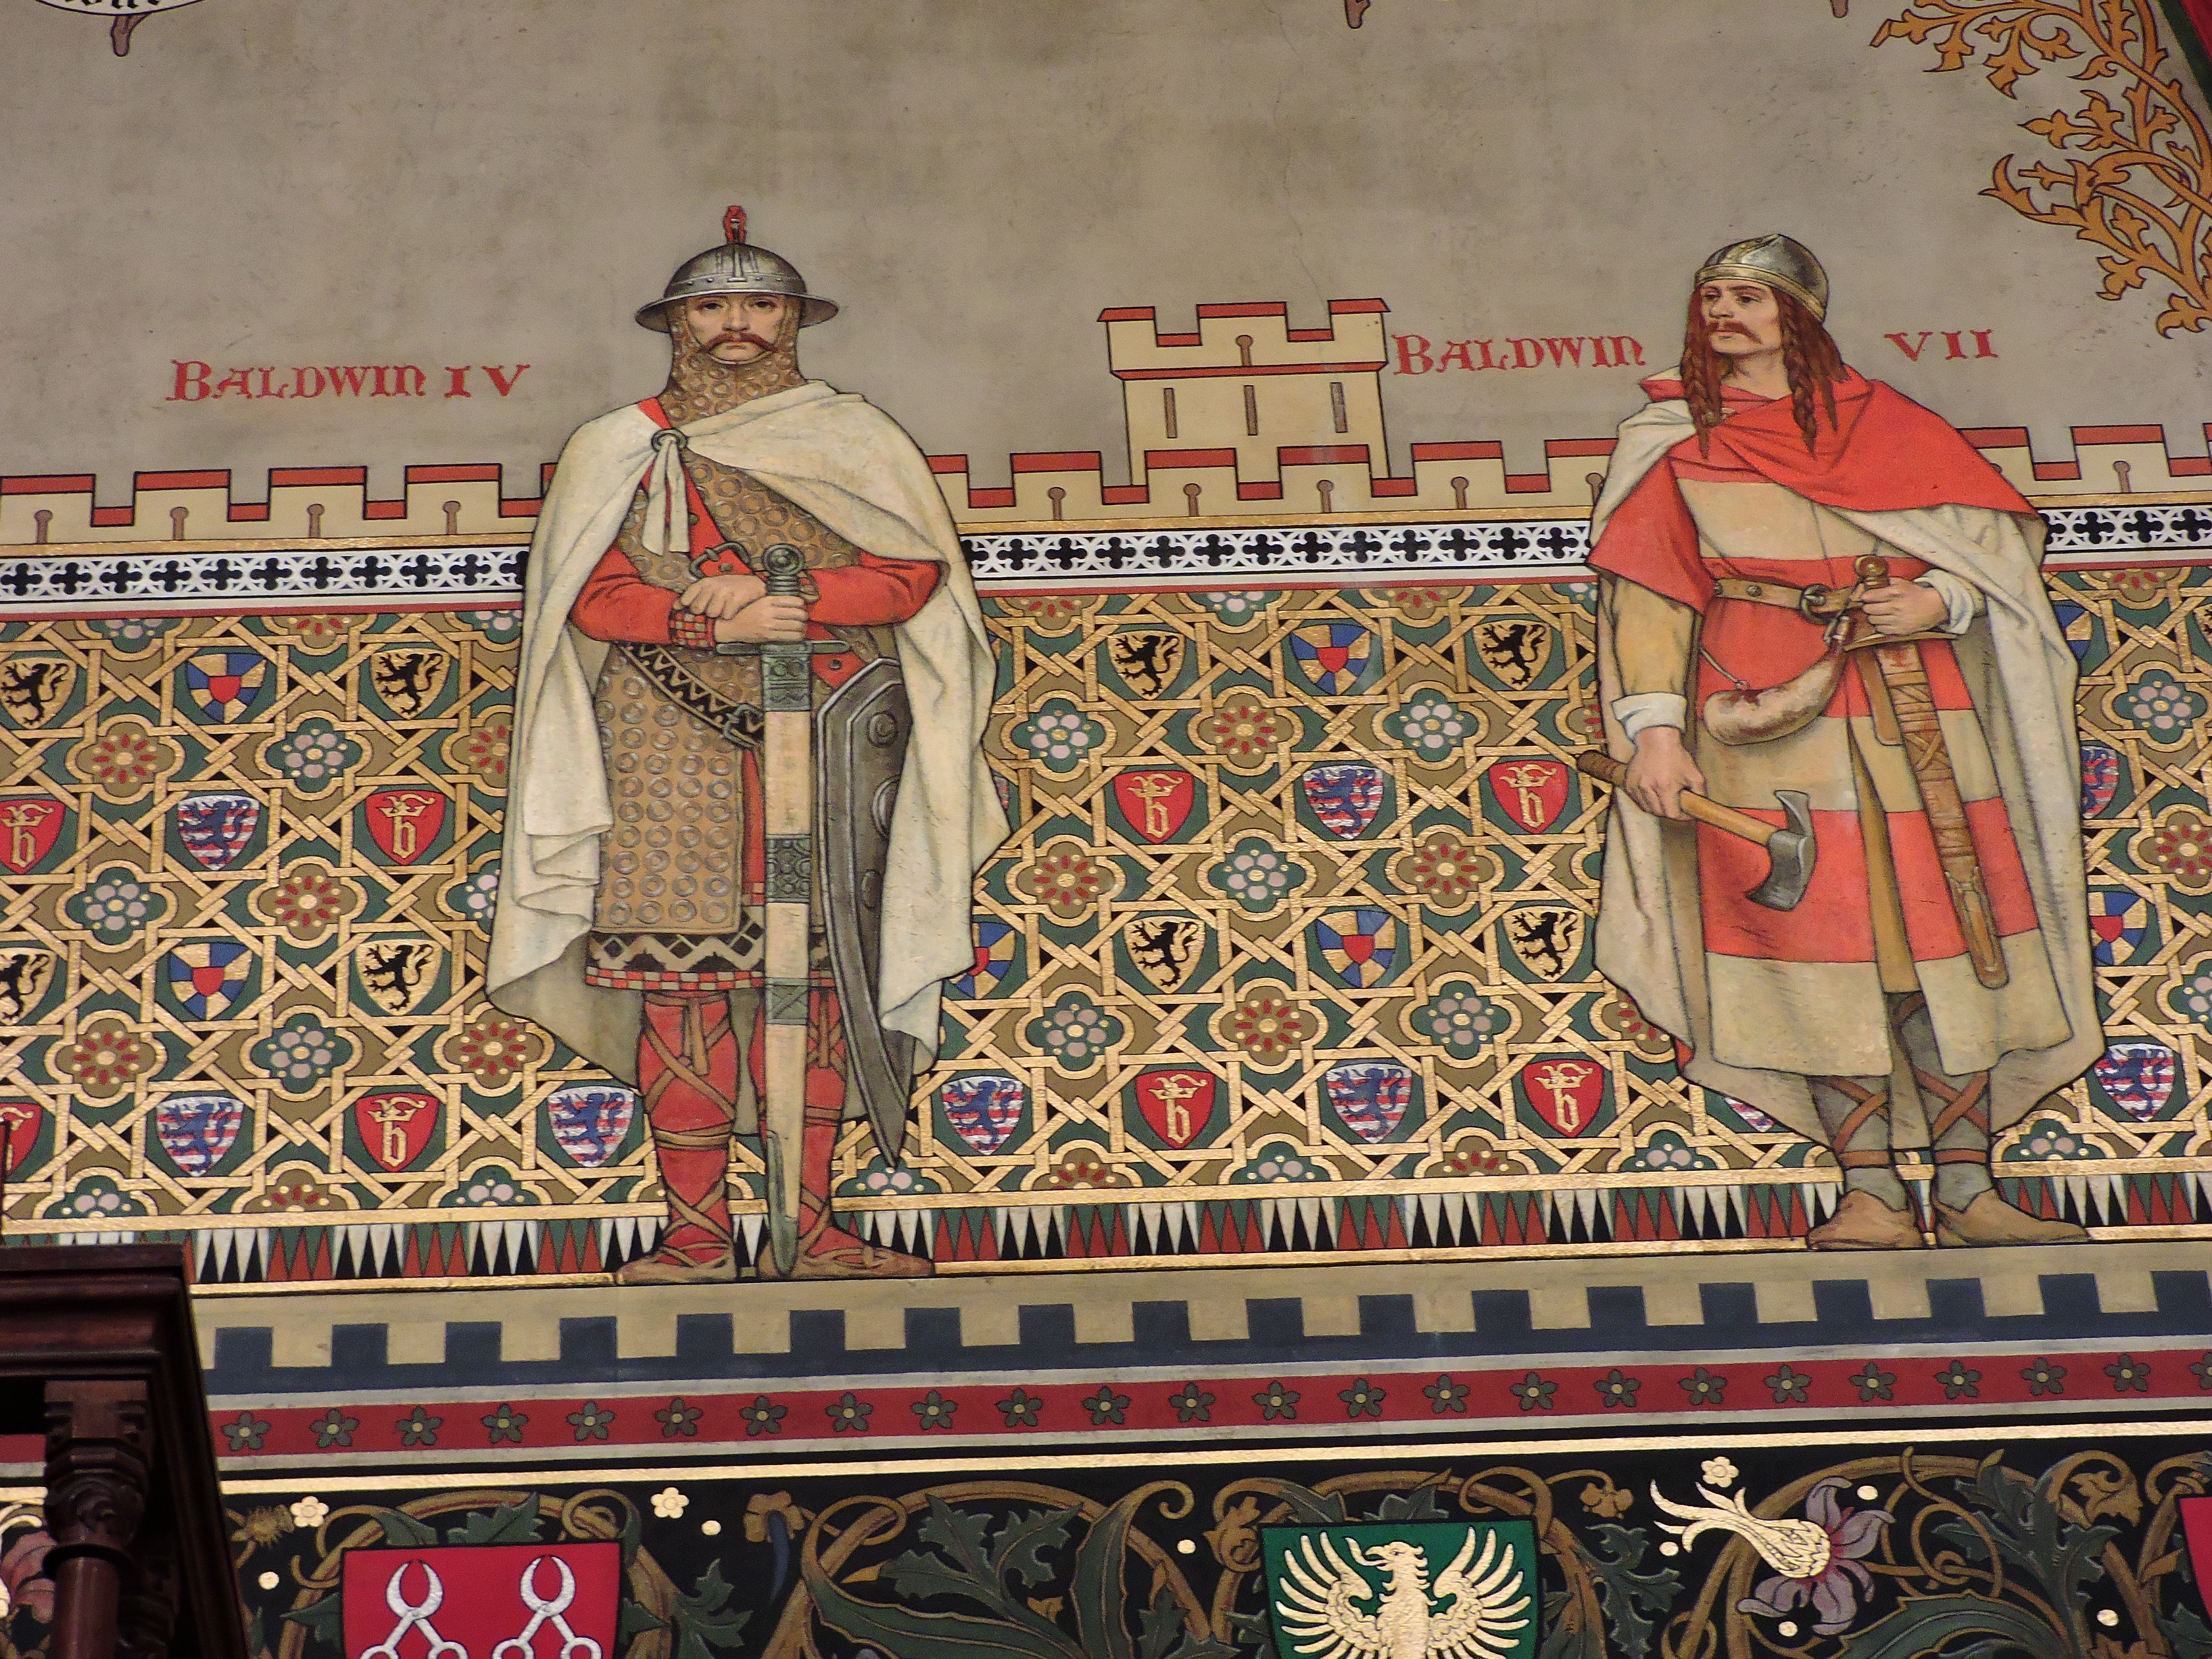 Baldwin IV & Baldwin VII, The Gothic Hall, City Hall (Stadhuis van Brugge), Burg sq., Bruges